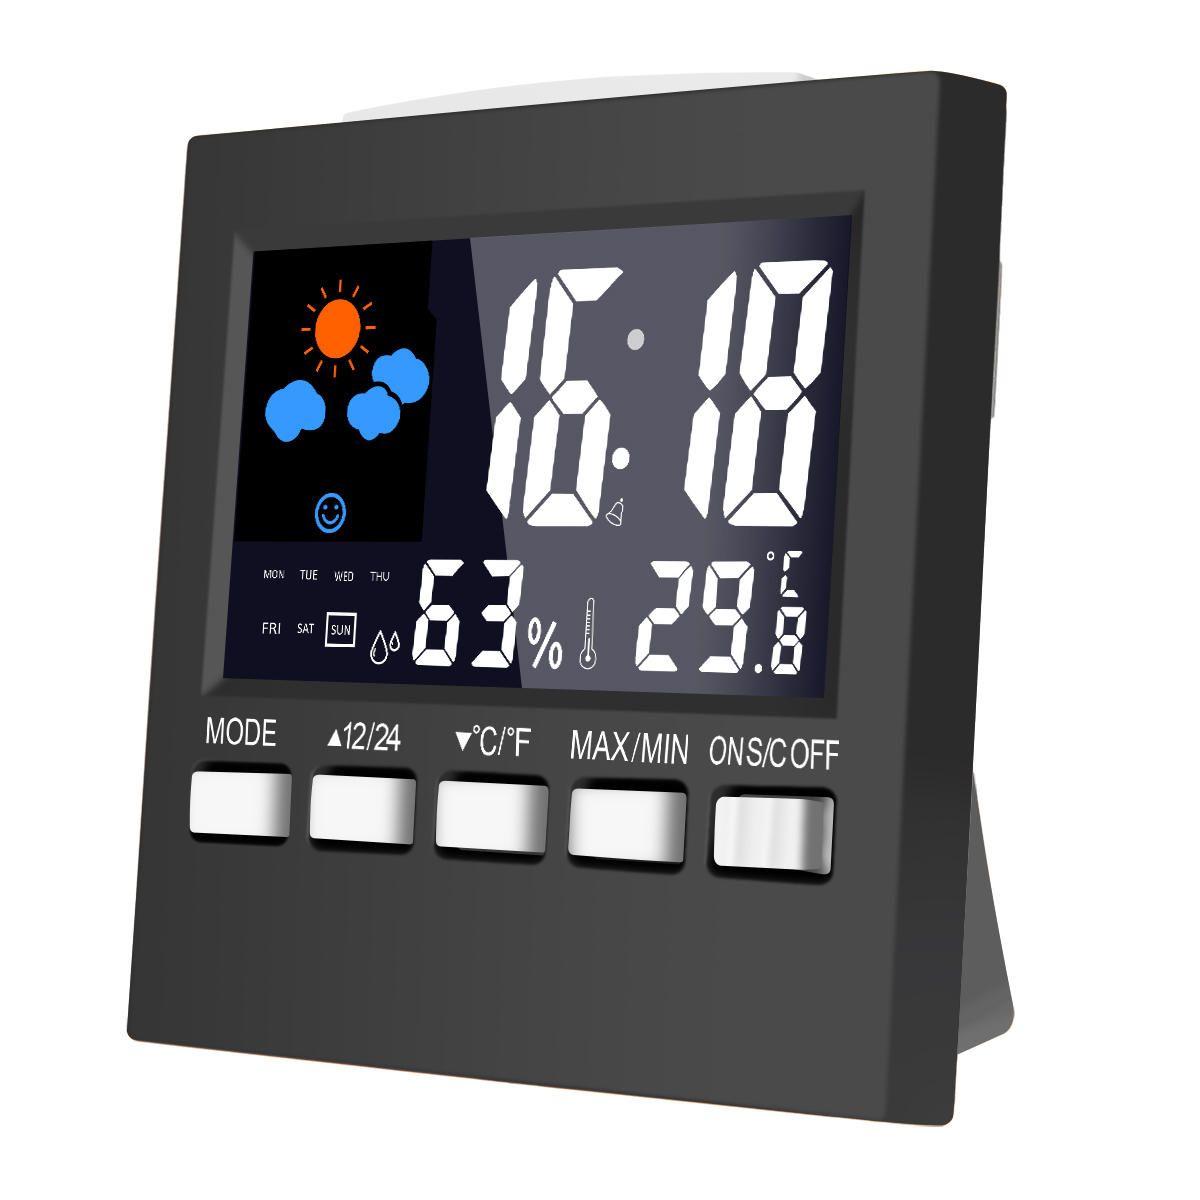 Loskii DC 001 Digital Temperature Humidity Alarm Clocks